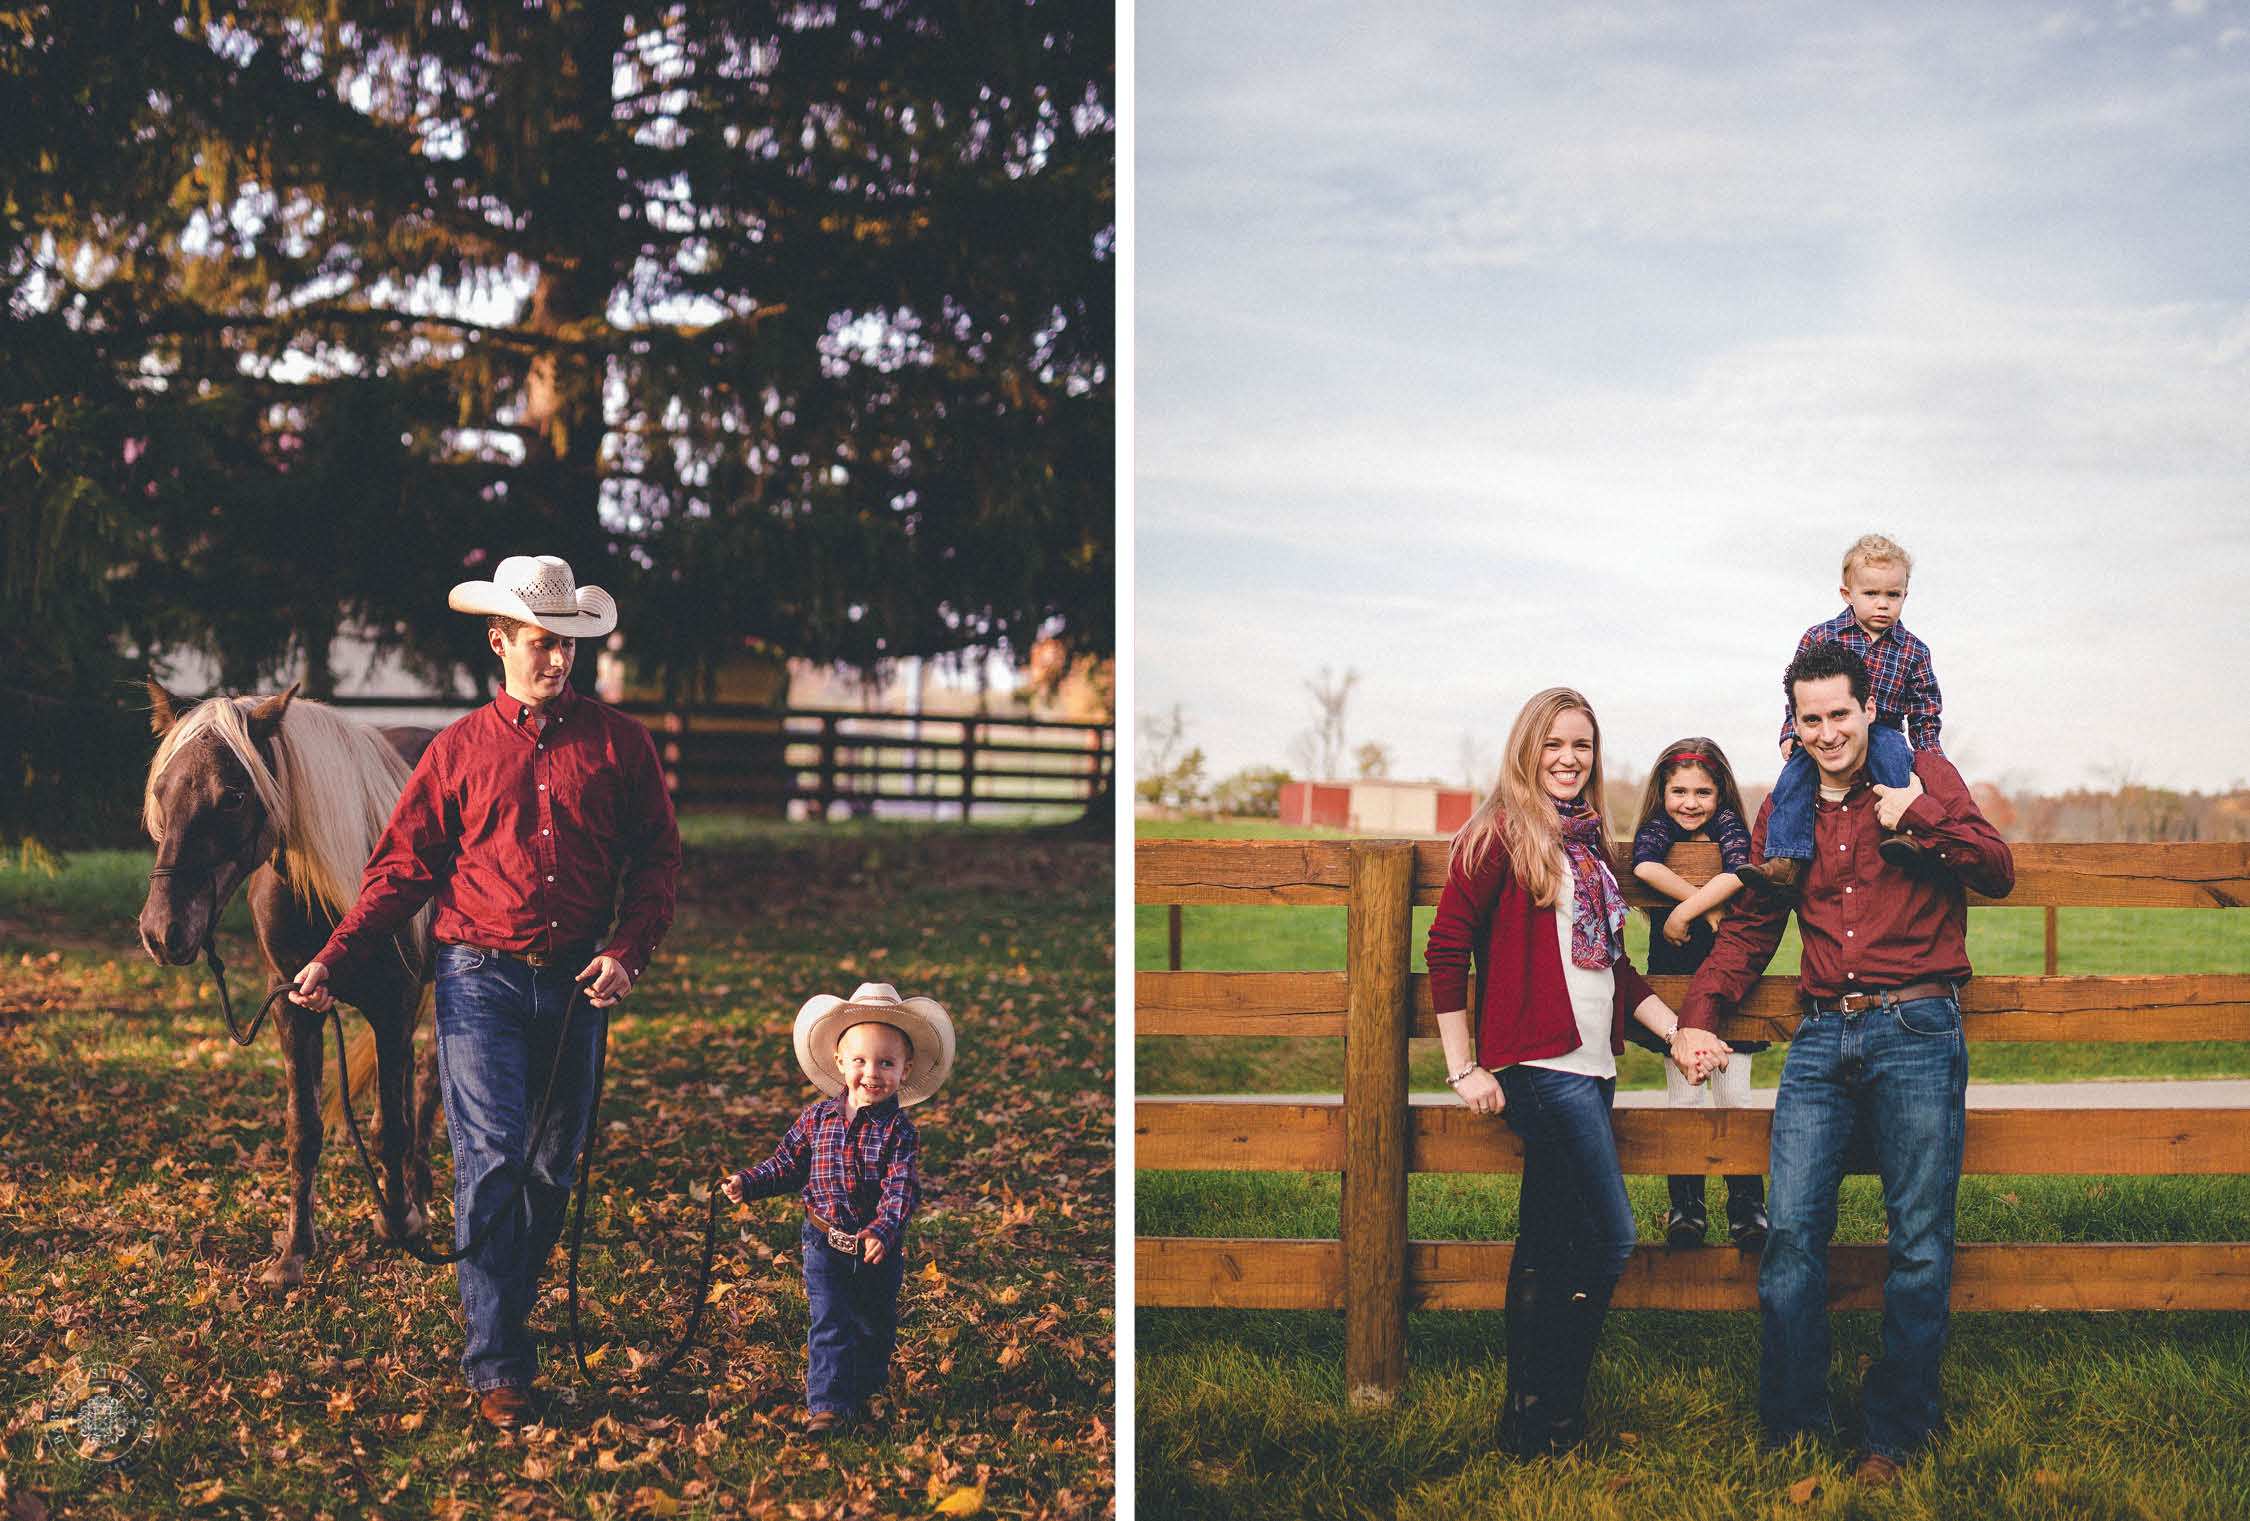 vance-family-children-photographer-dayton-ohio-5.jpg